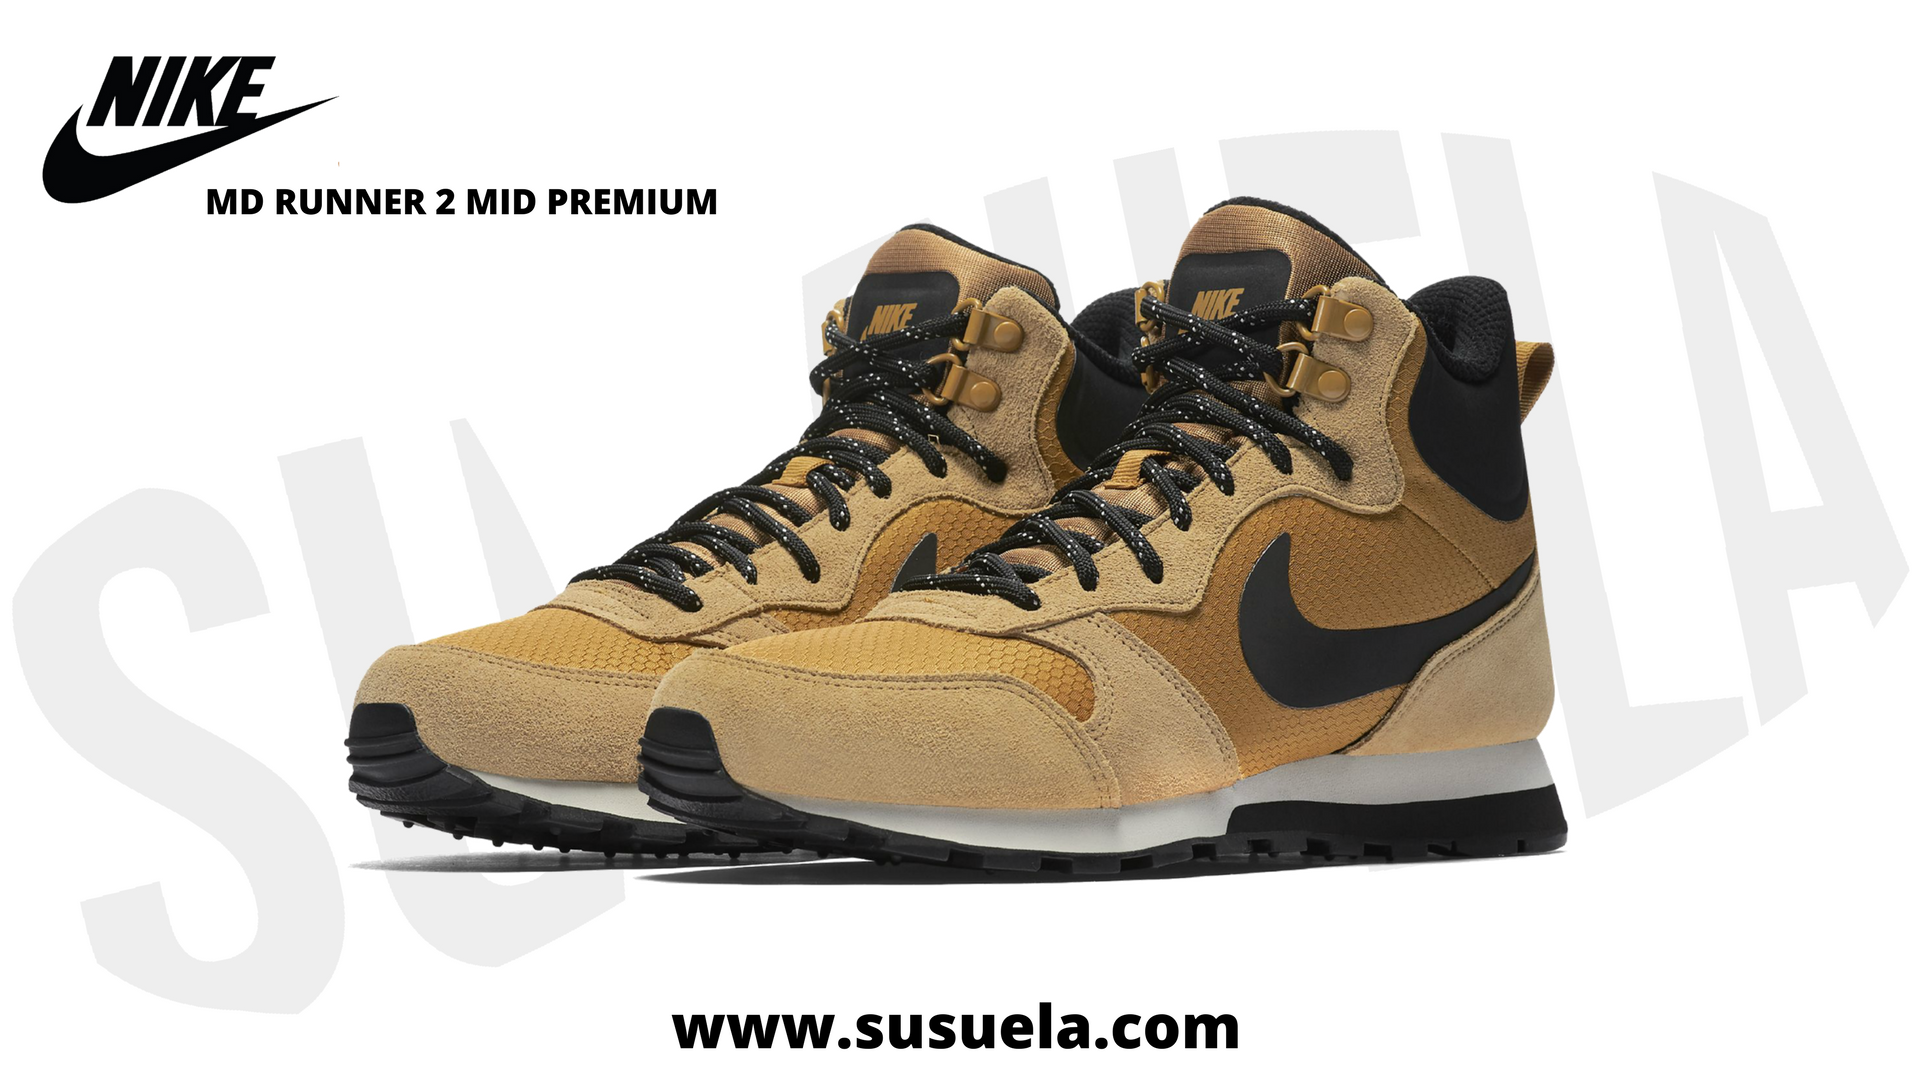 best cheap bd3b4 d4561 Nike MD RUNNER 2 MID PREMIUM en SUSUELA ! Bota retro muy cómoda y elegante.